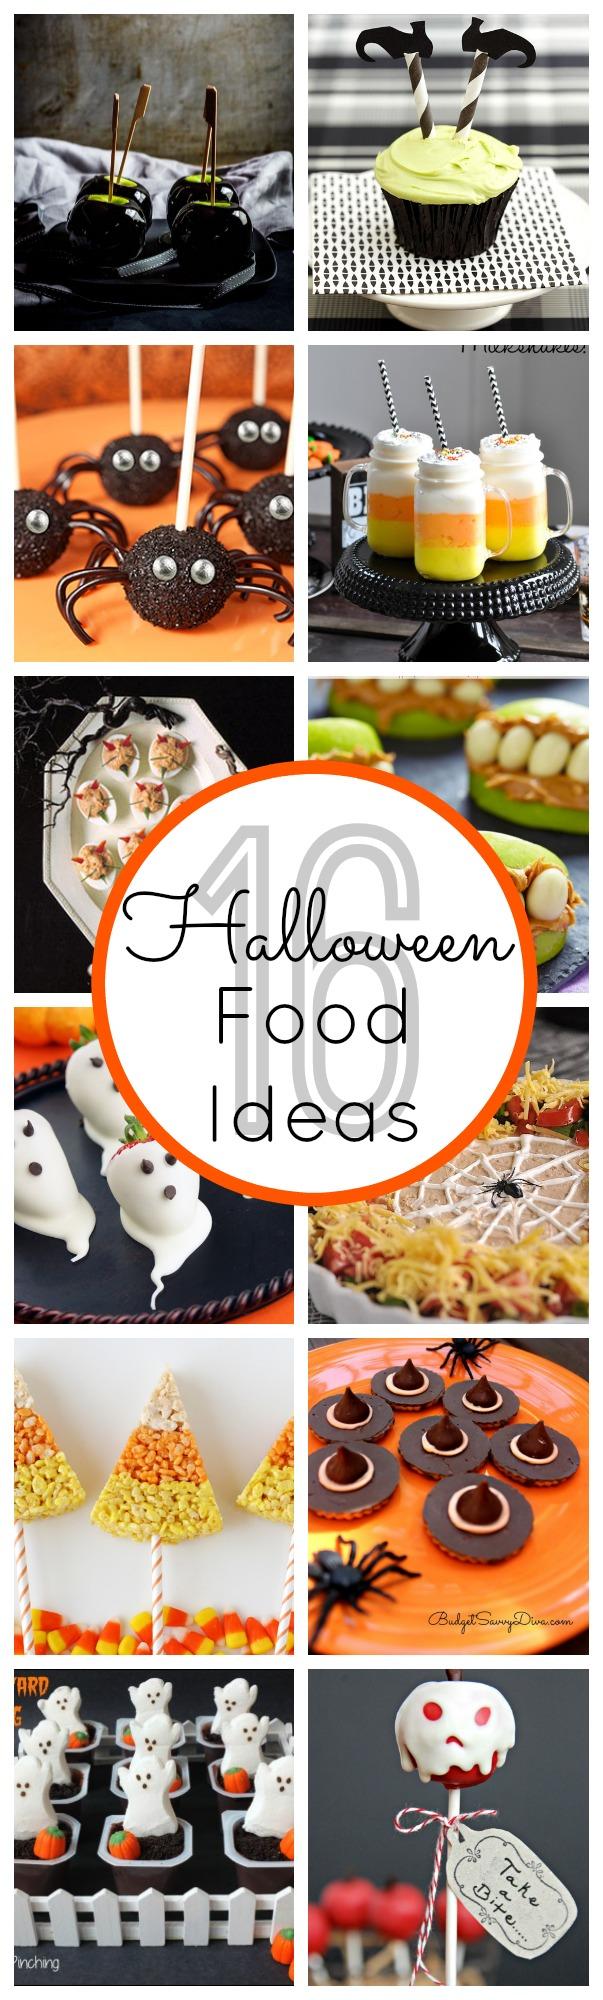 16 fun halloween food ideas for Cuisine halloween